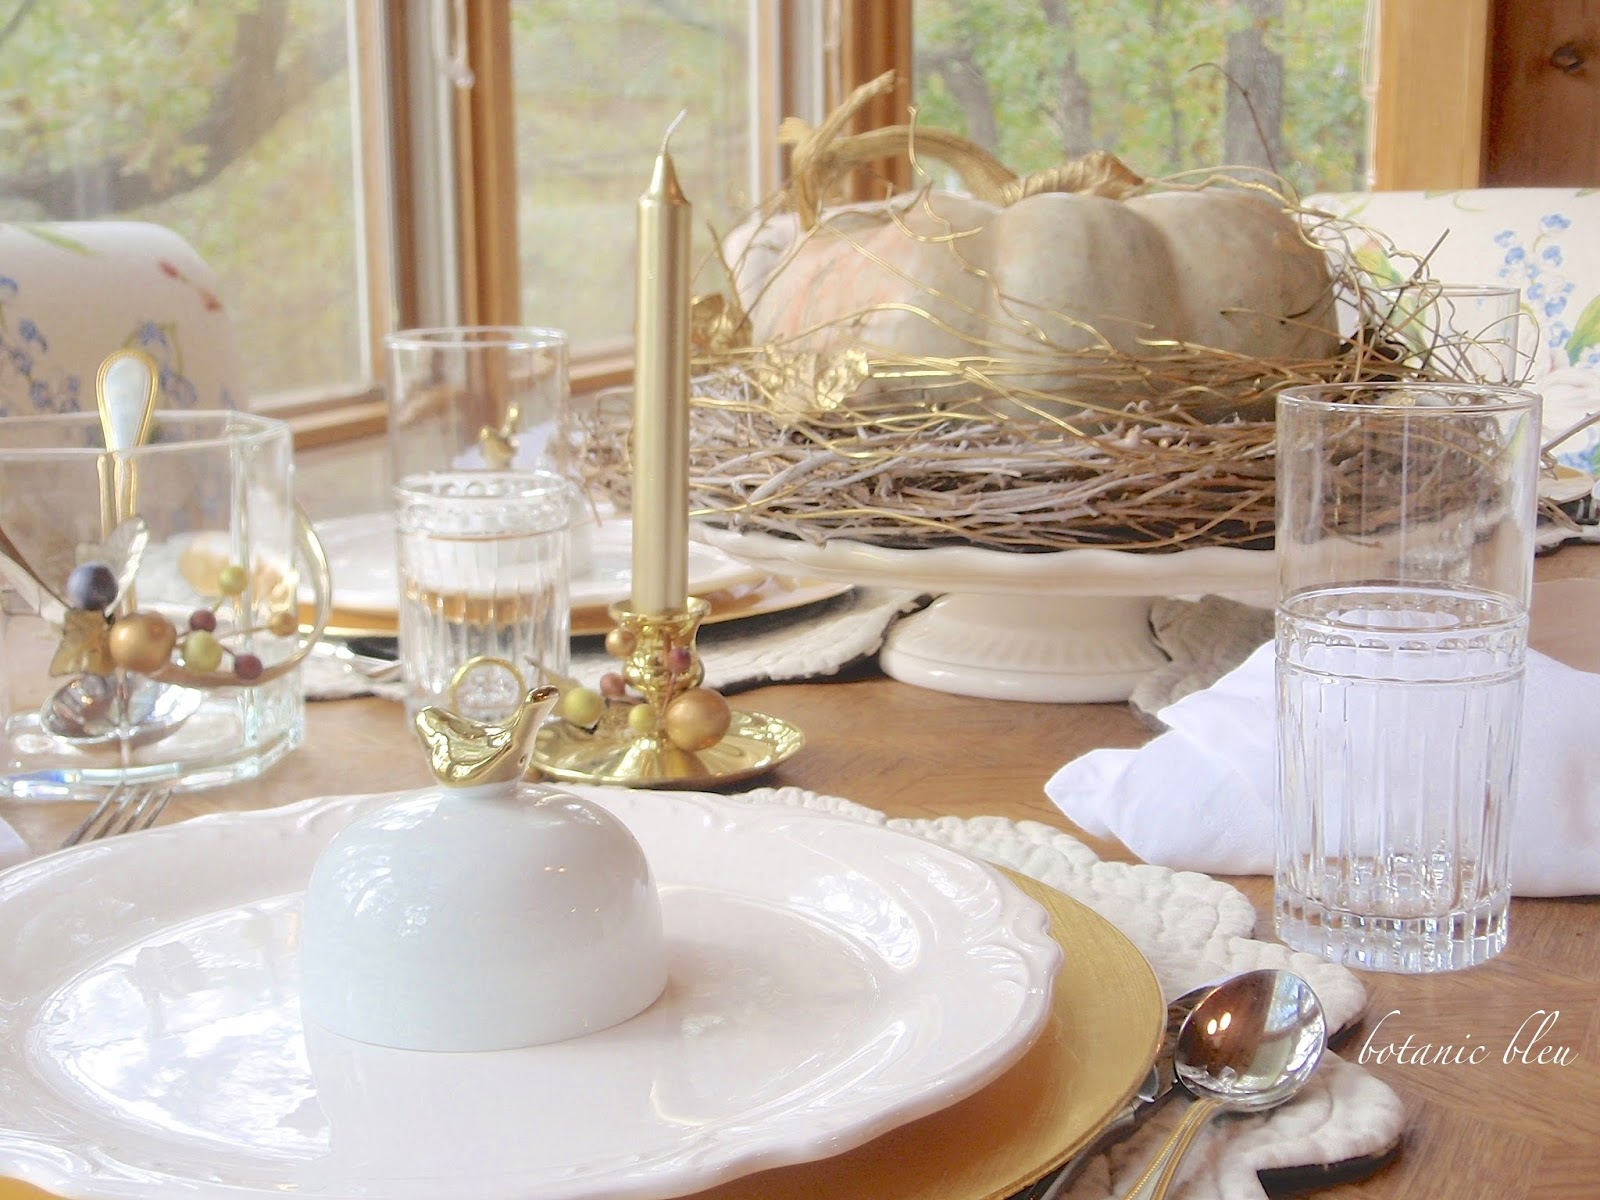 botanic bleu thanksgiving gold and white table. Black Bedroom Furniture Sets. Home Design Ideas